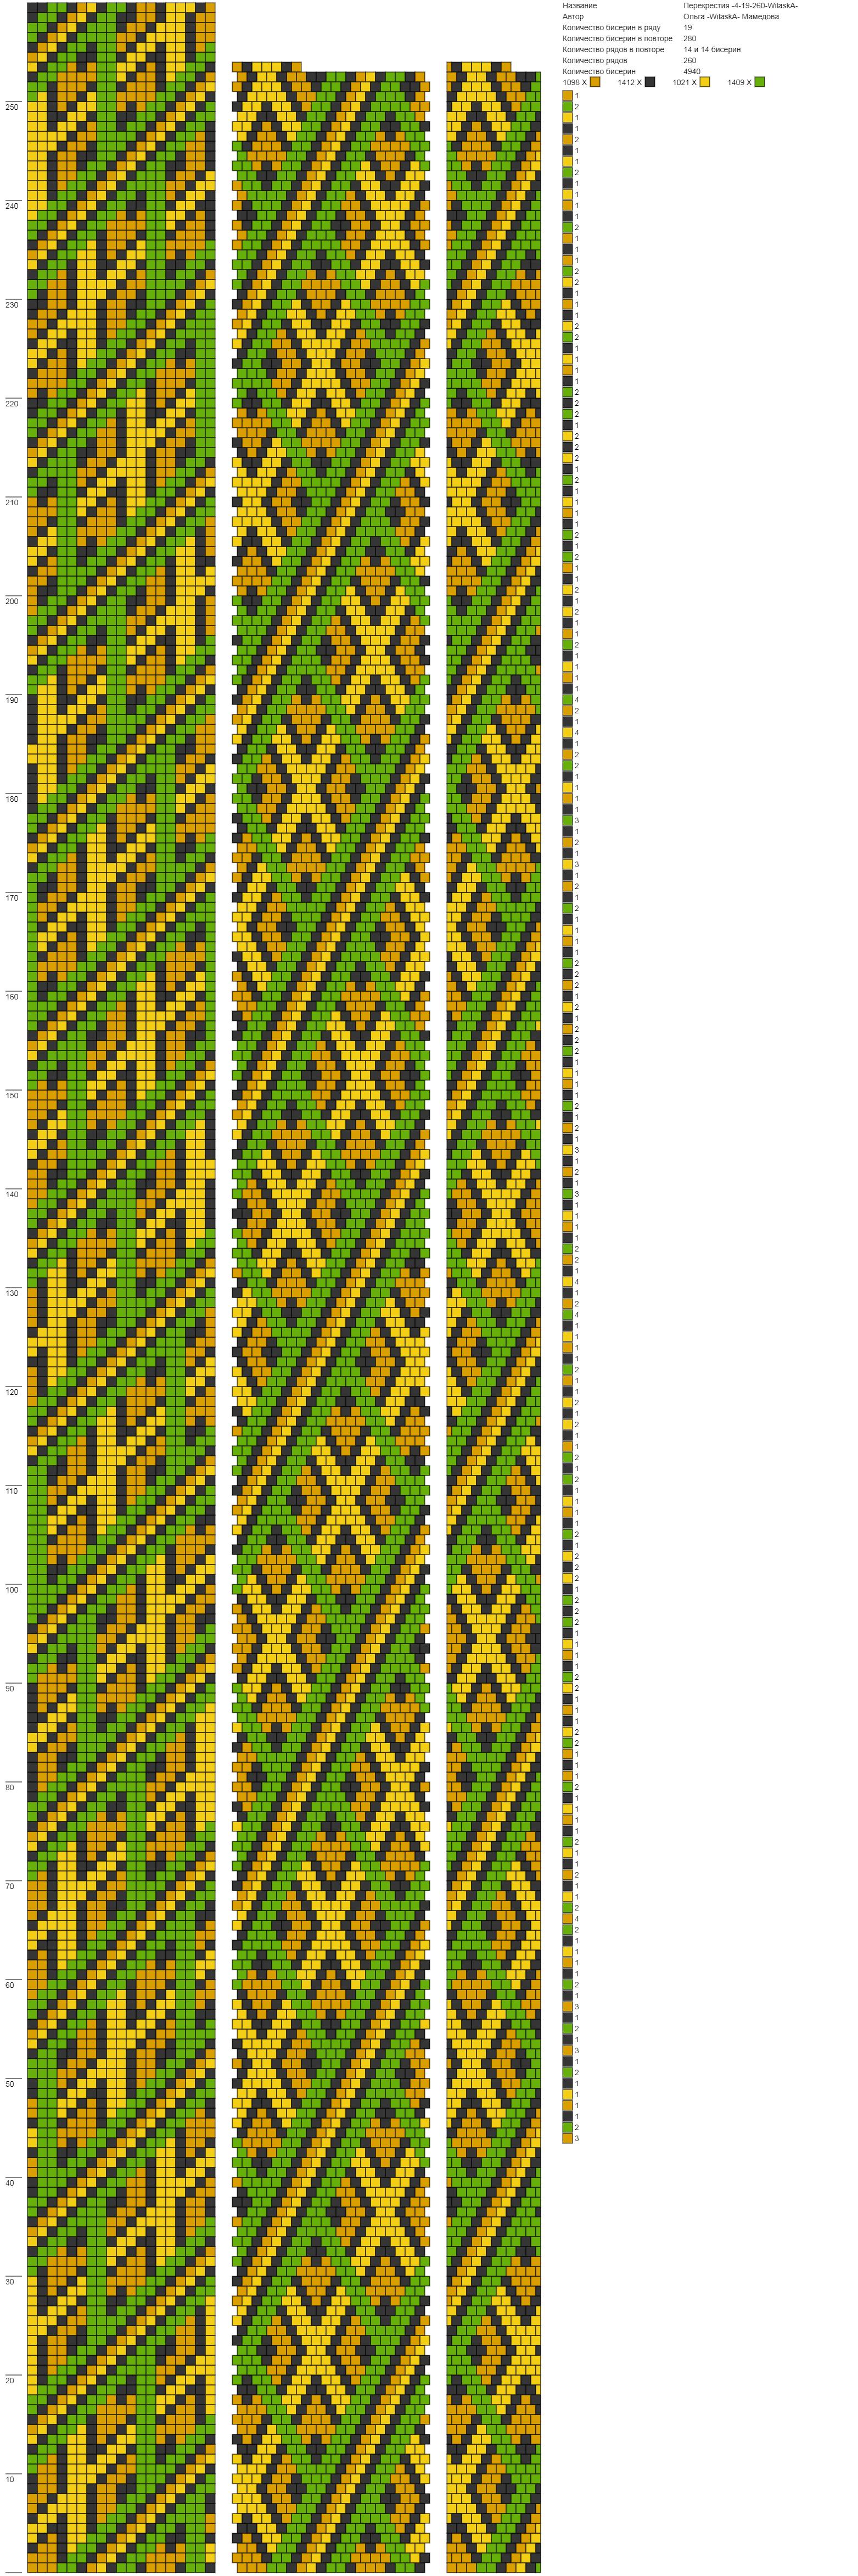 Pin By Heike Roth On Taki Spiral Dokuma Bead Crochet Rope Bead Crochet Crochet Rope